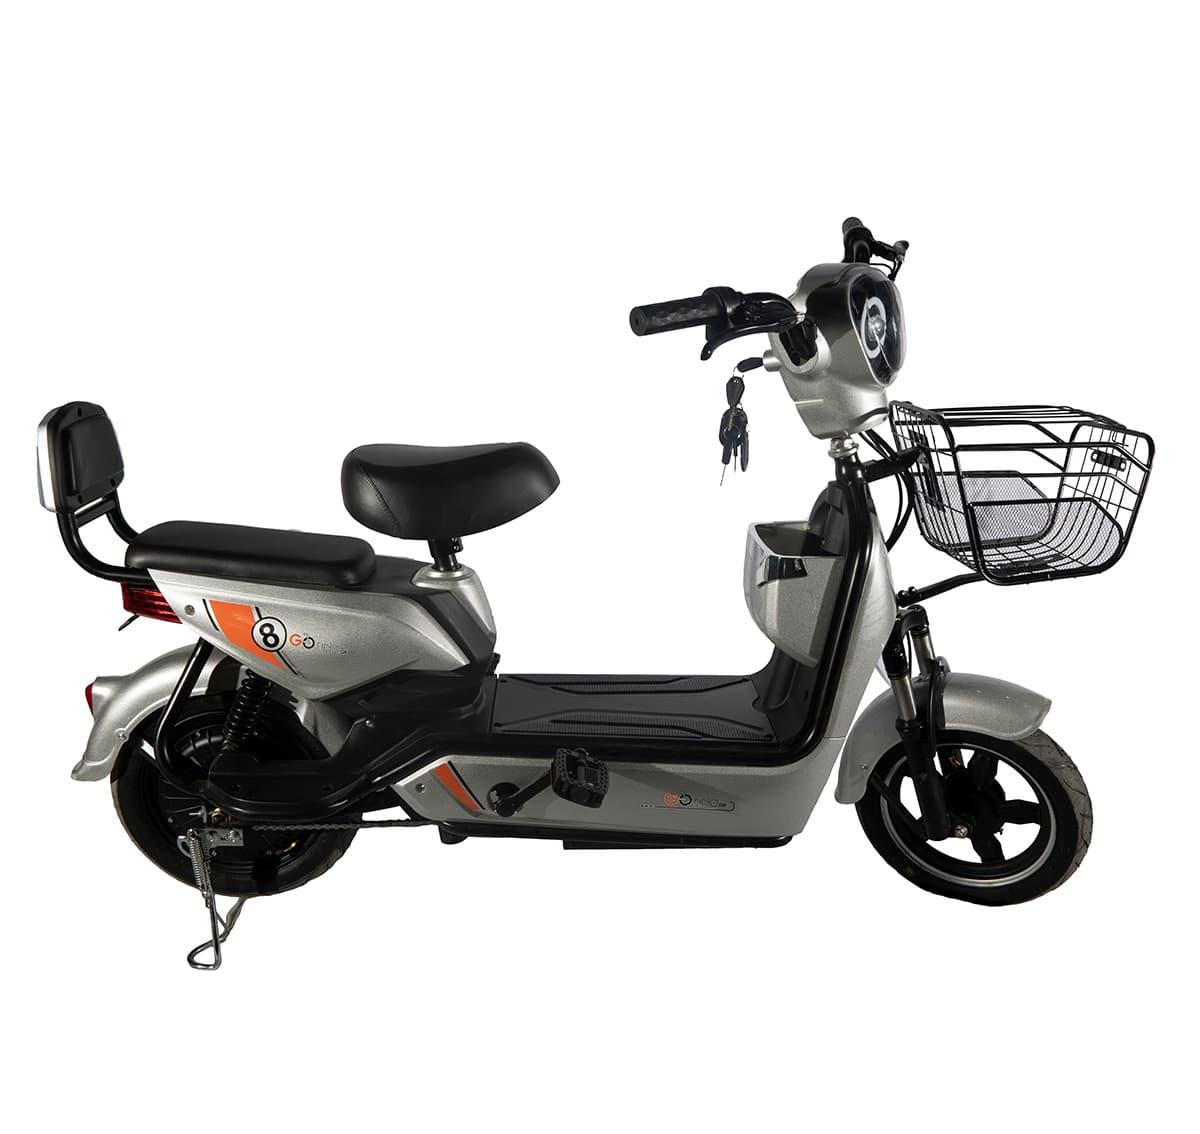 goride-scooters-bicis-electricas